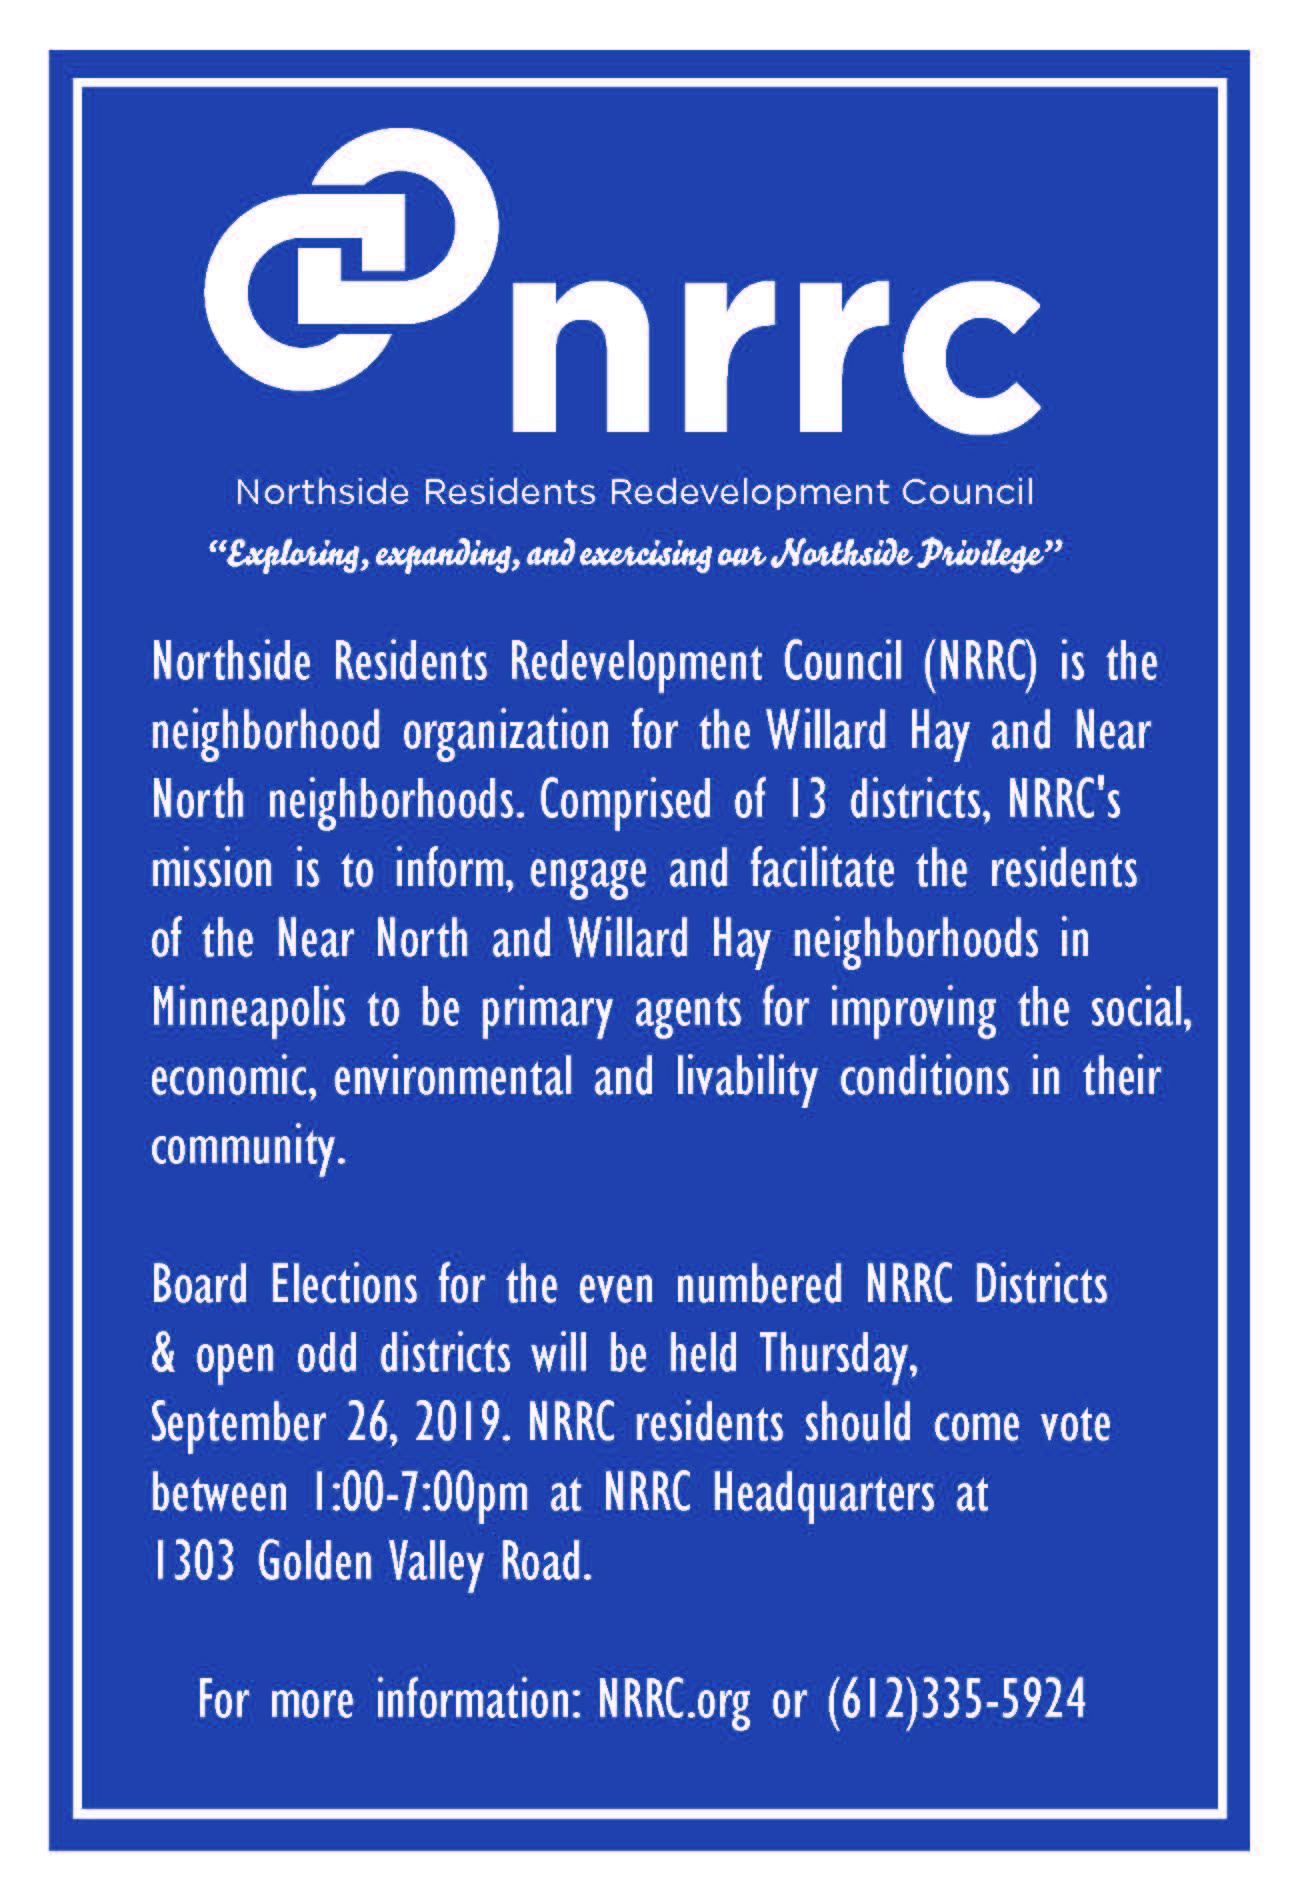 NRRC Elections Flyer.jpg